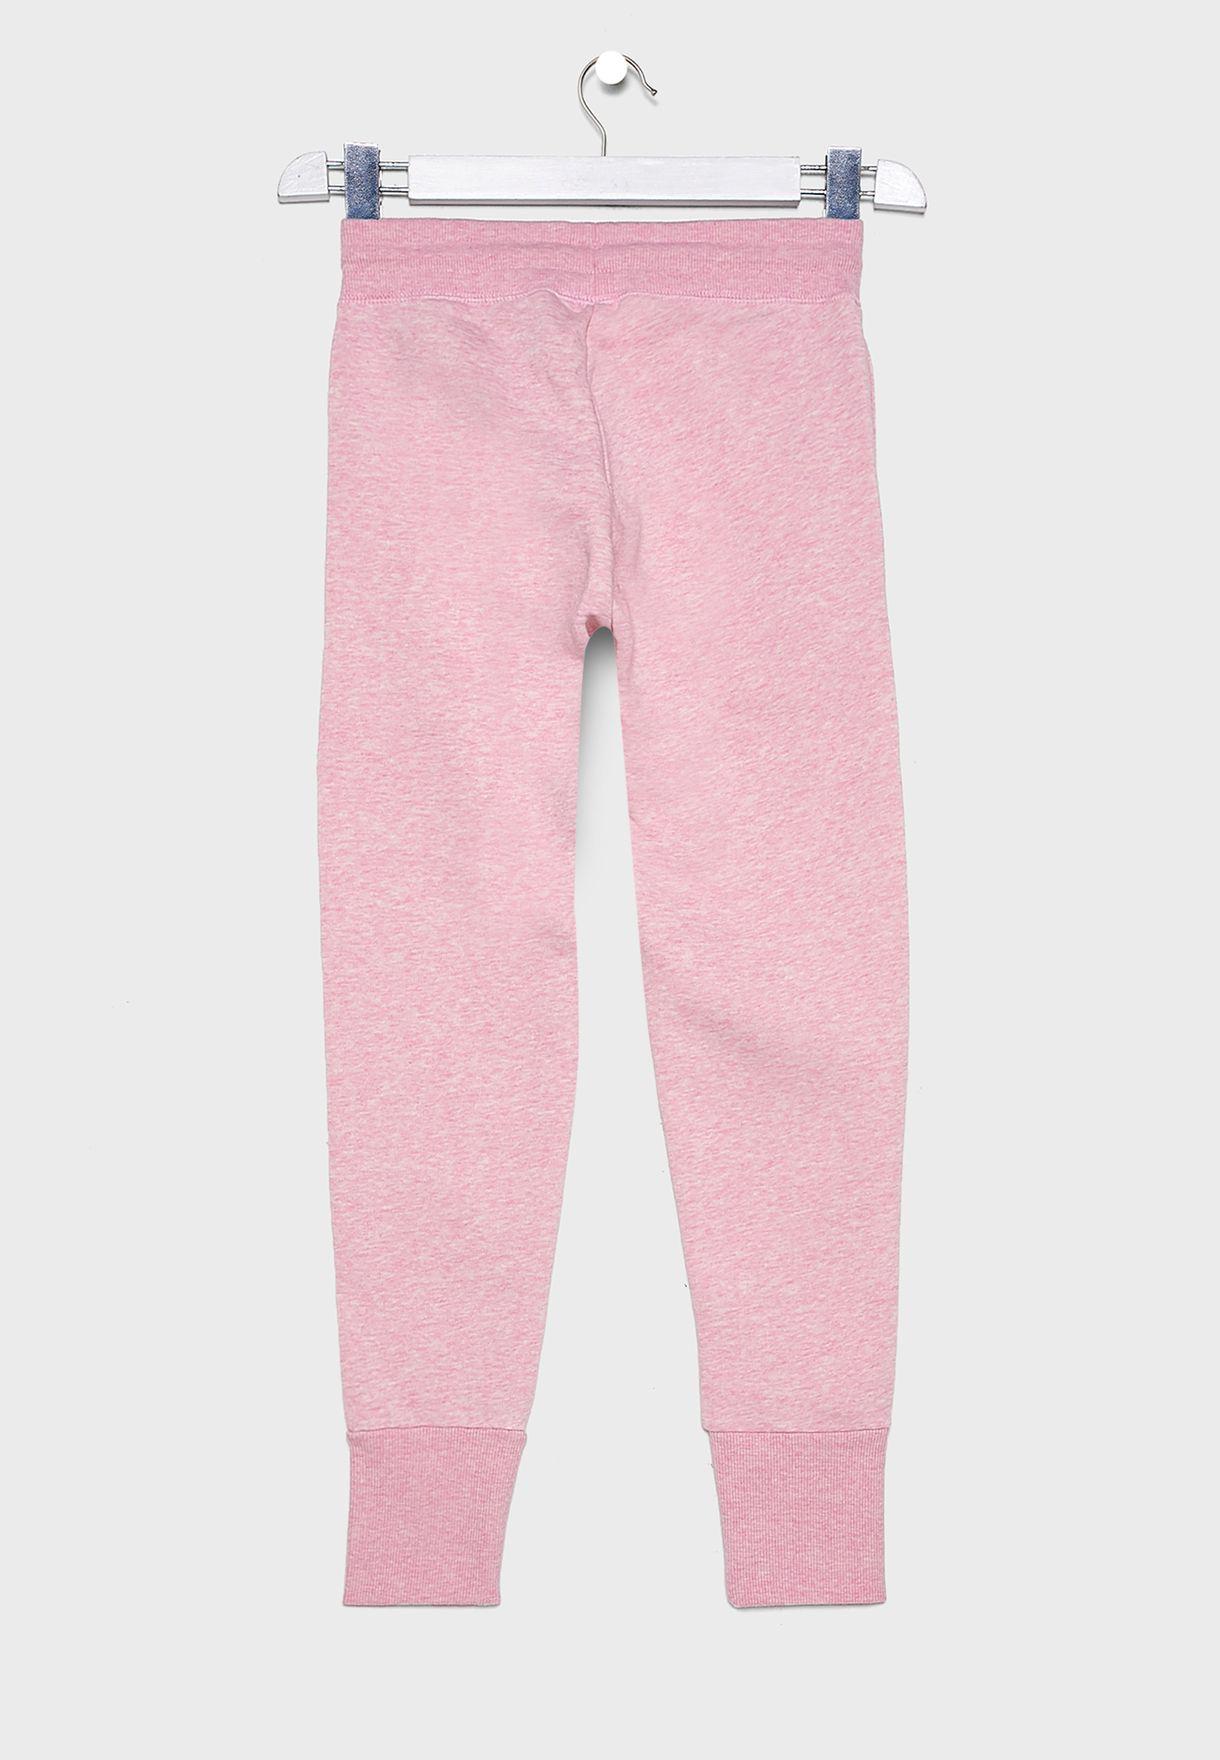 Kids Cuffed Printed Sweatpants